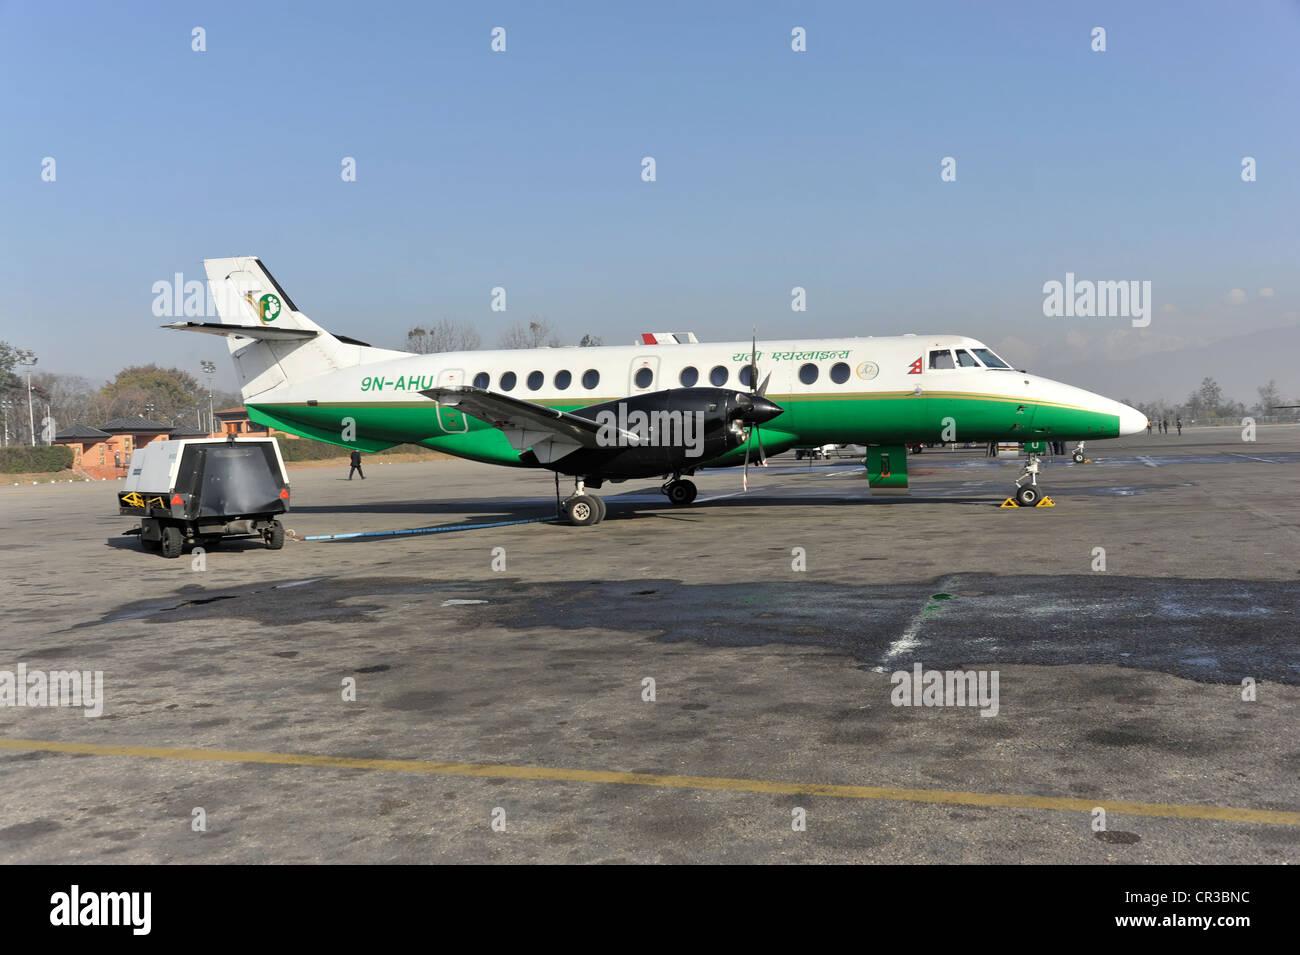 Yeti Airlines aircraft for a scenic flight, Kathmandu, Nepal, Asia - Stock Image